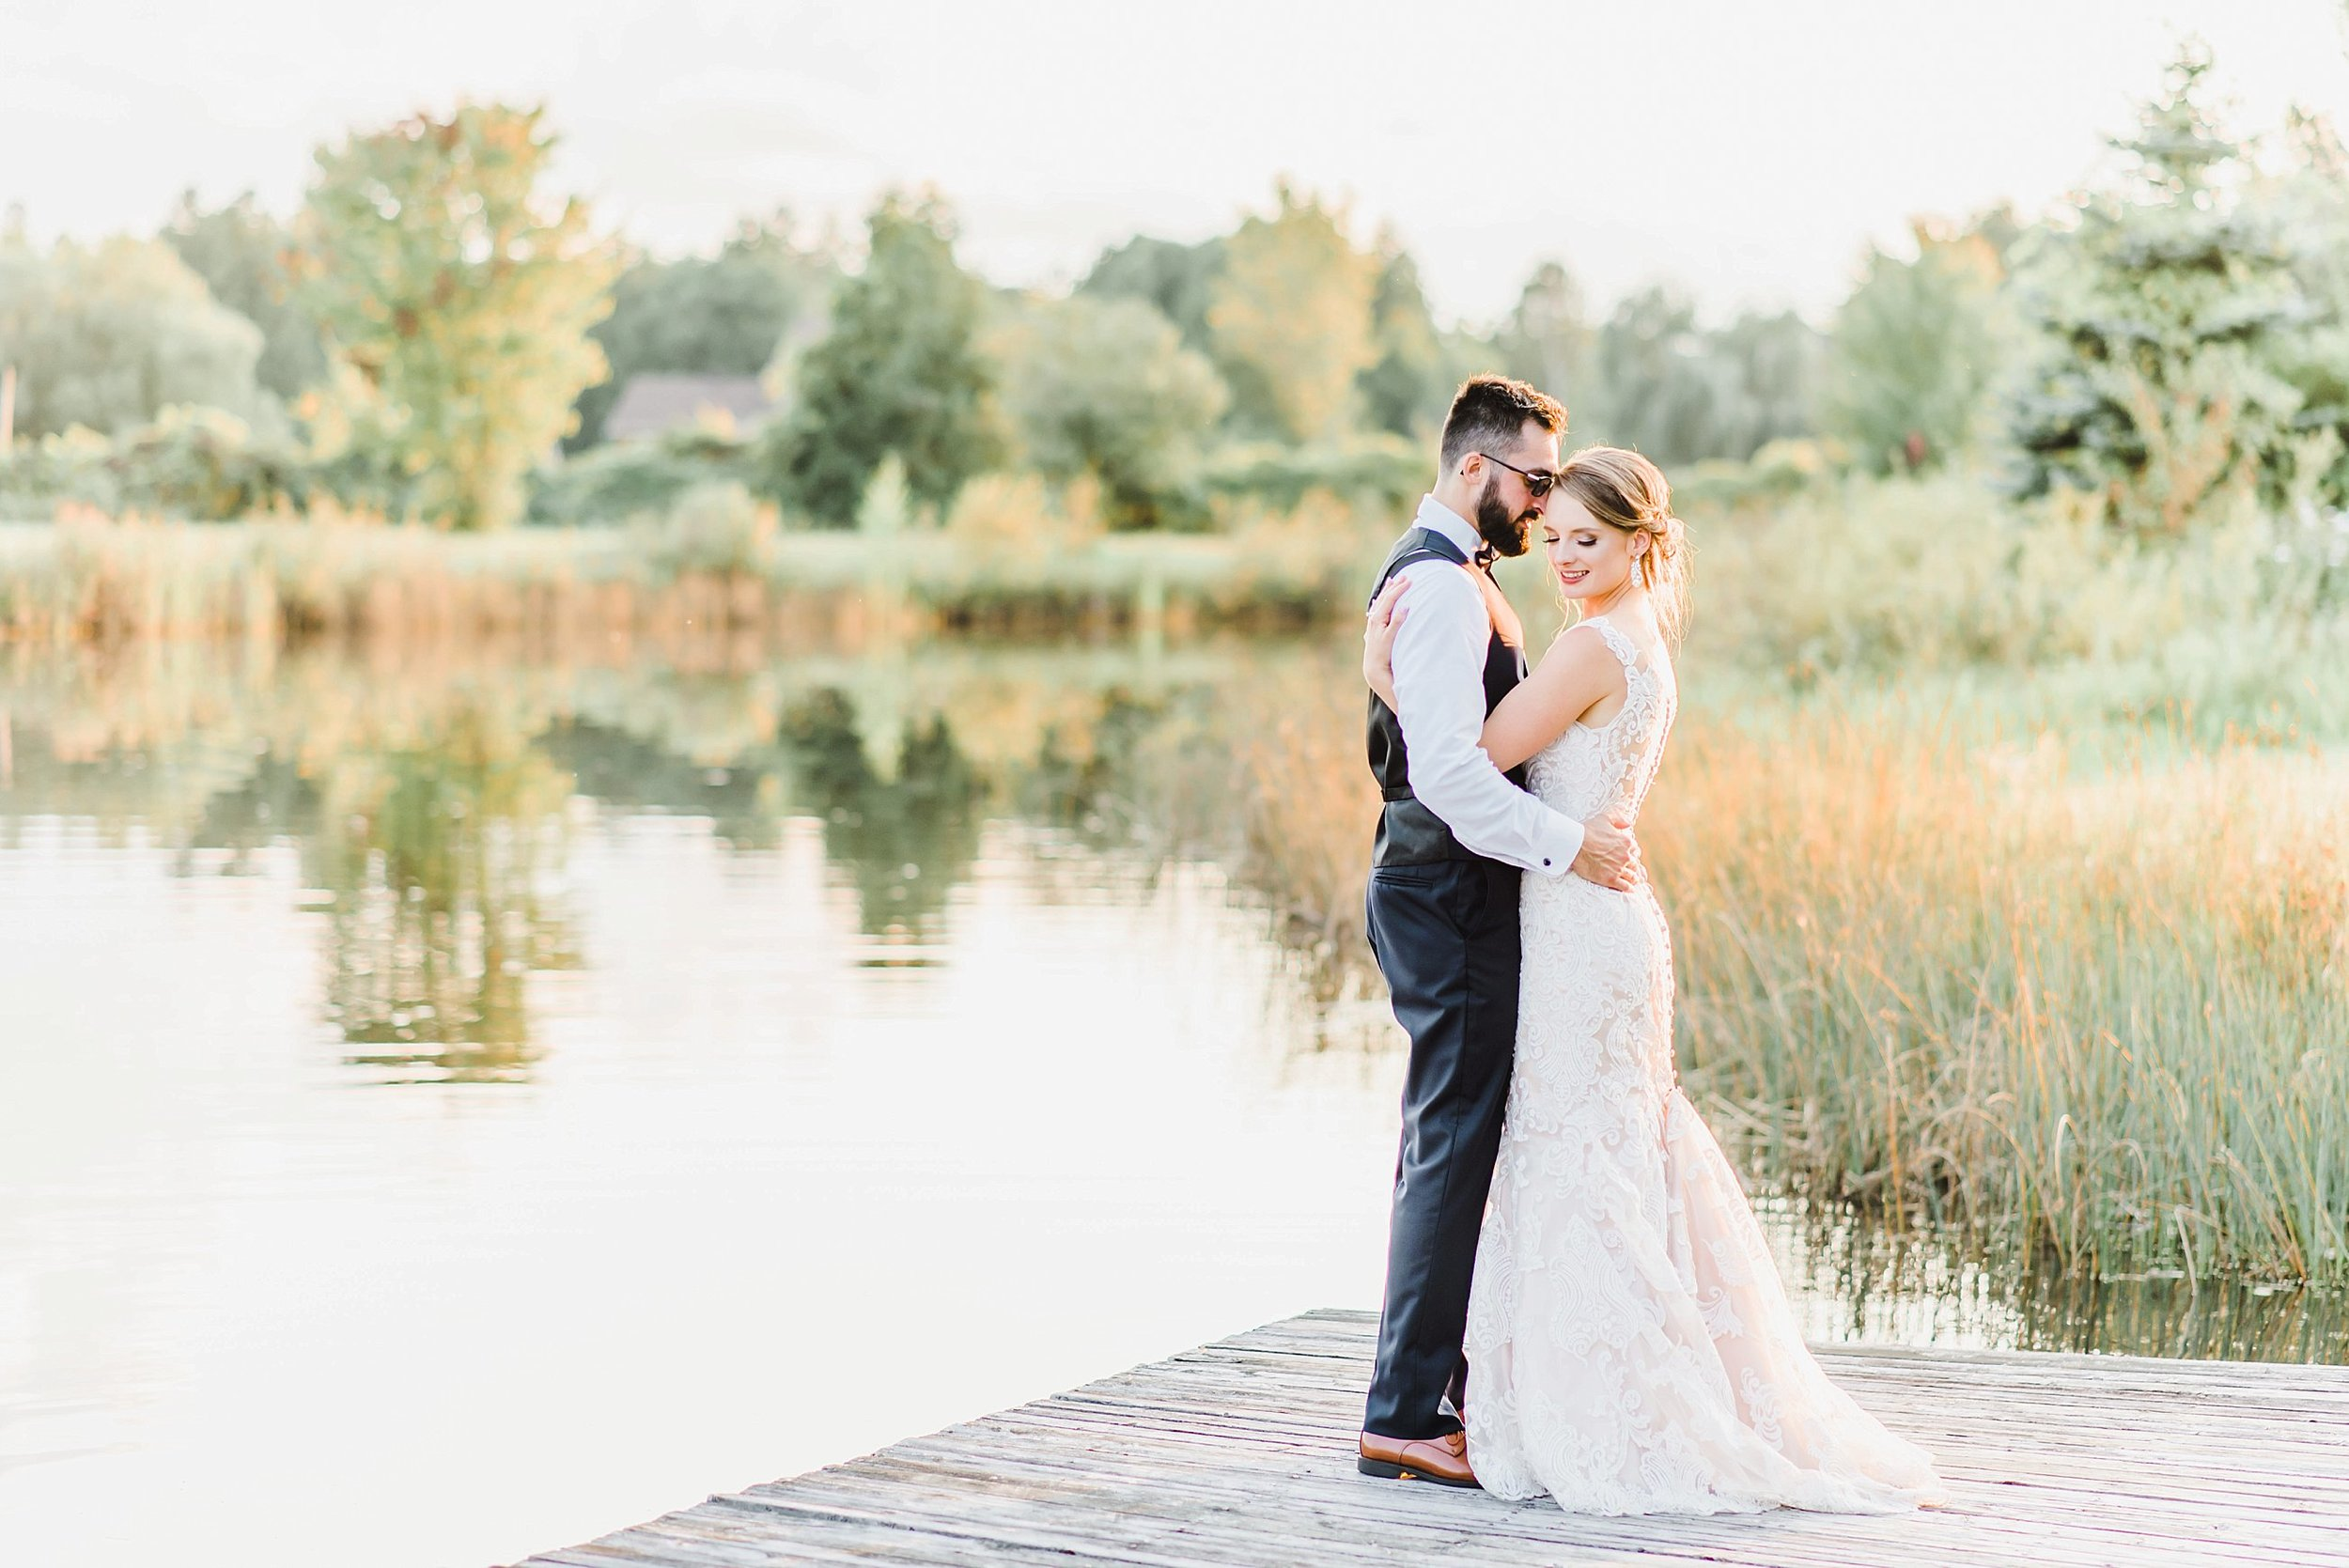 light airy indie fine art ottawa wedding photographer | Ali and Batoul Photography_1351.jpg